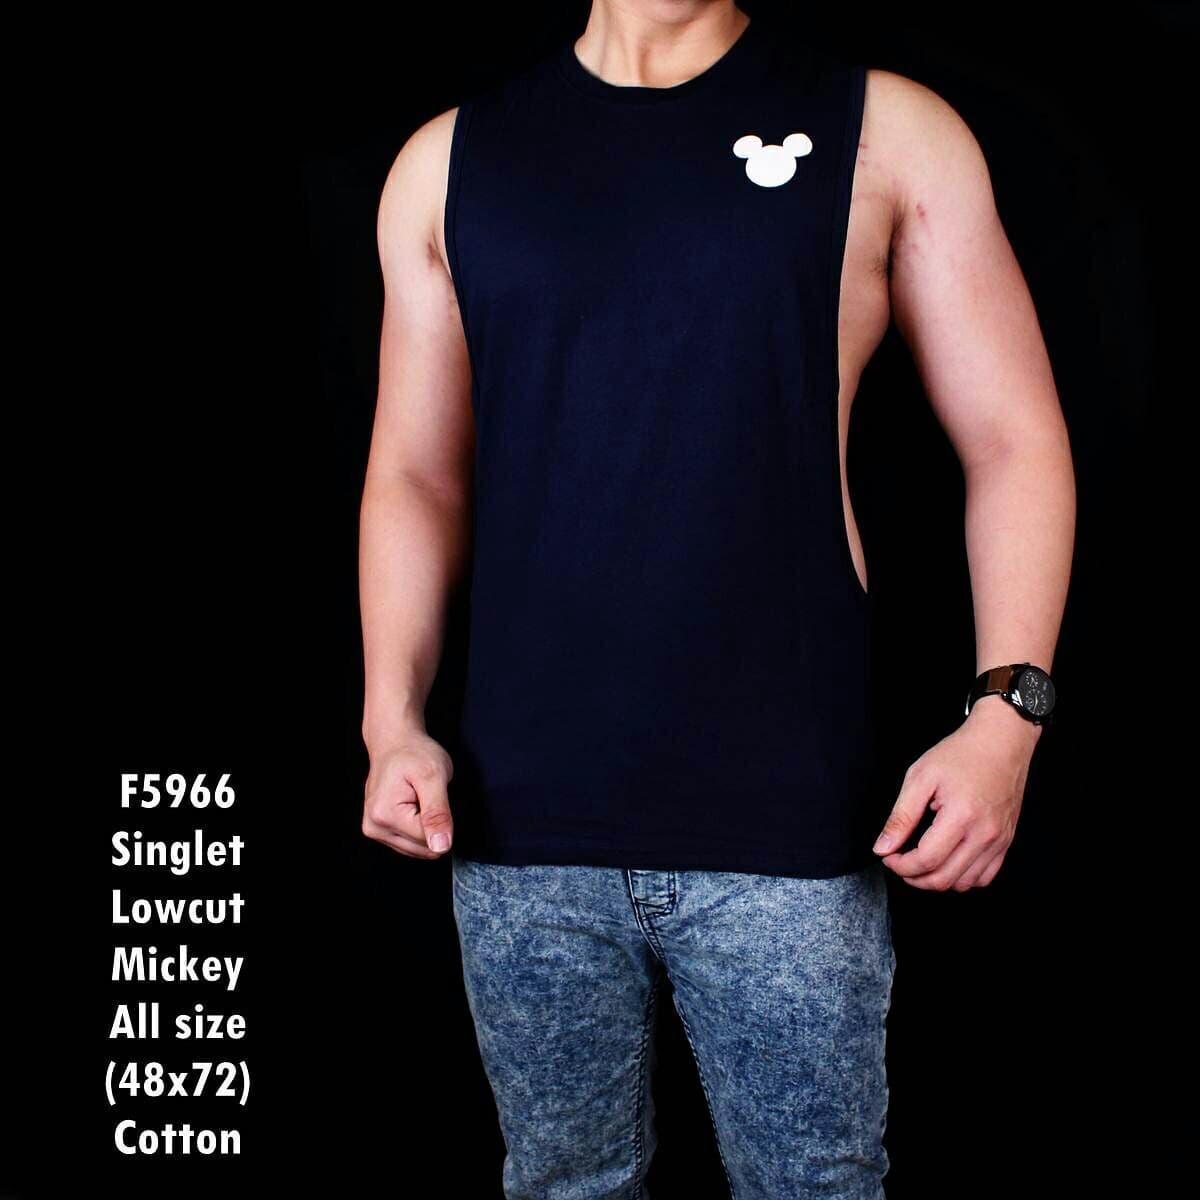 Singlet Kaos Kutang Tanktop Low Cut Mickey Symbol Navy 5966Rp55.000